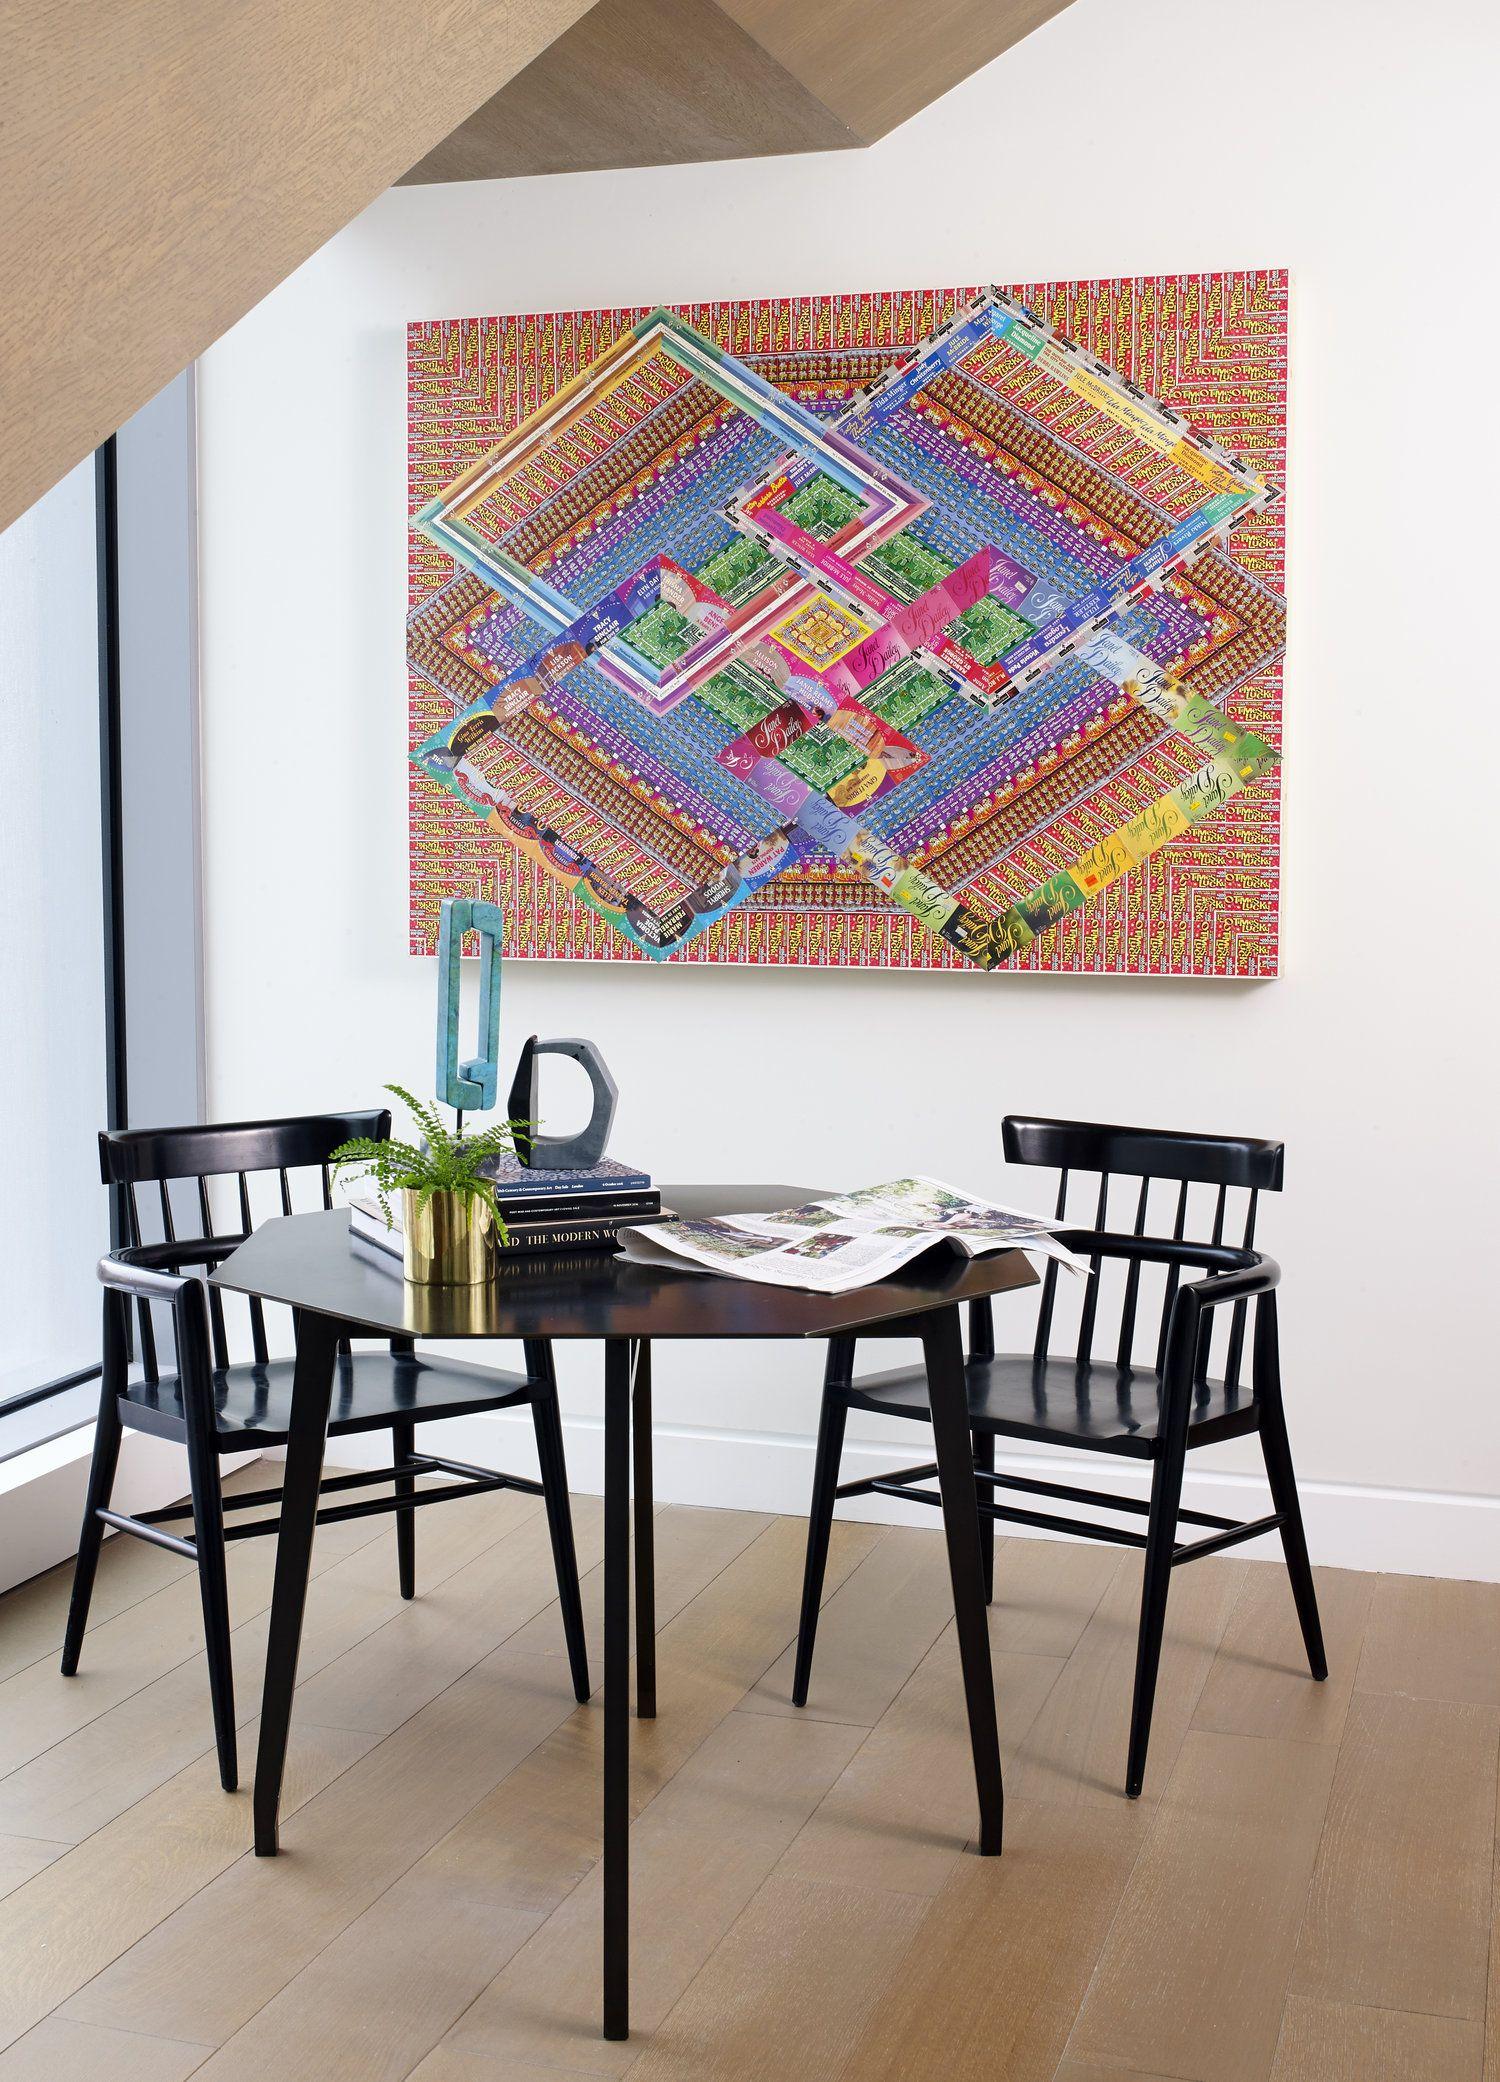 50 Chic Home Decorating Ideas Easy Interior Design And Decor Tips - Creative-home-decorating-ideas